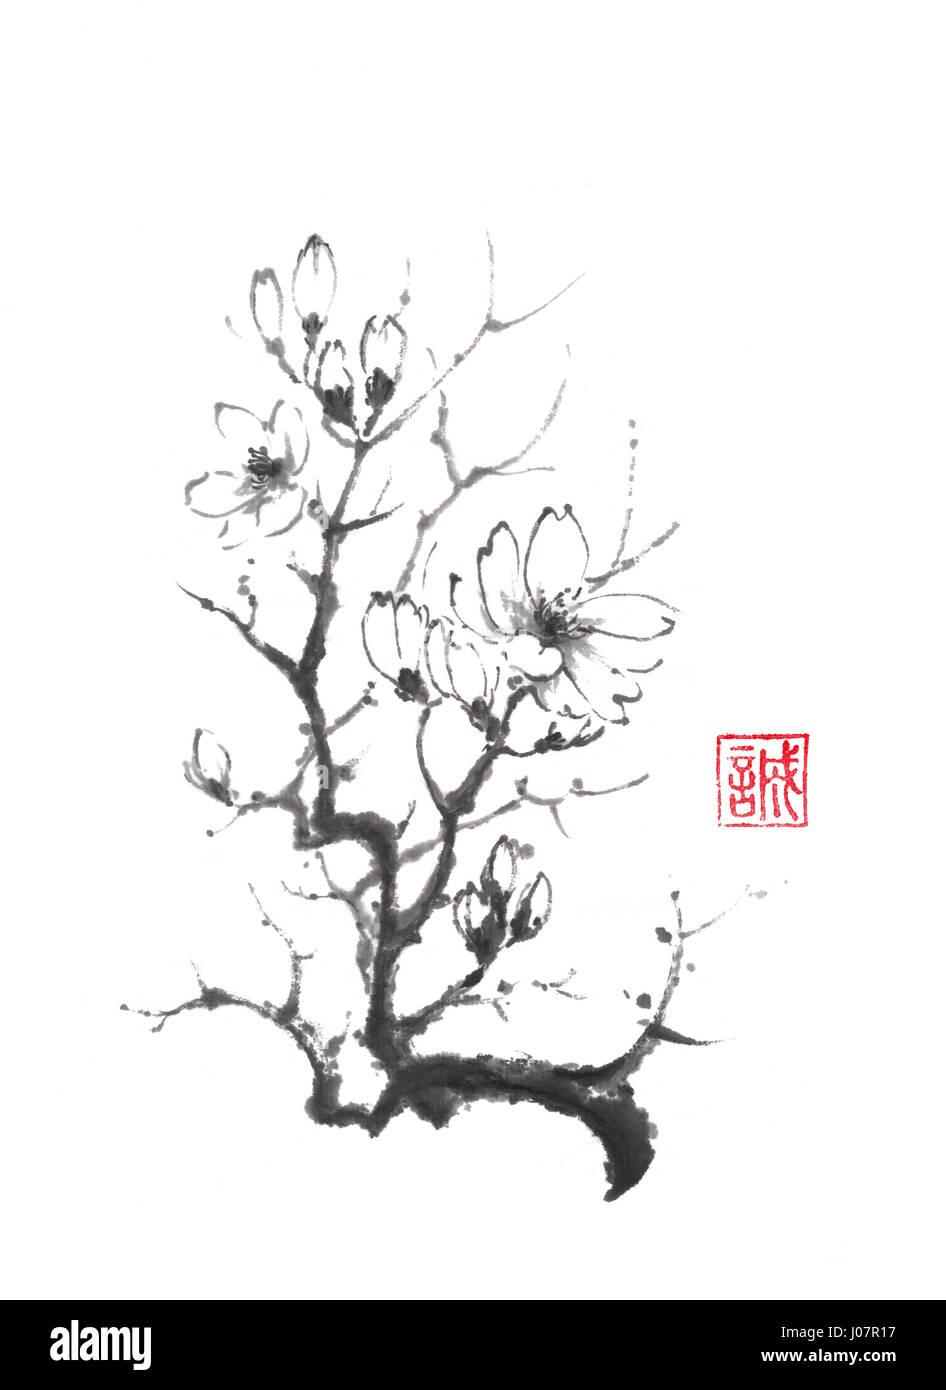 Blooming magnolia tree Japanese style original sumie ink painting